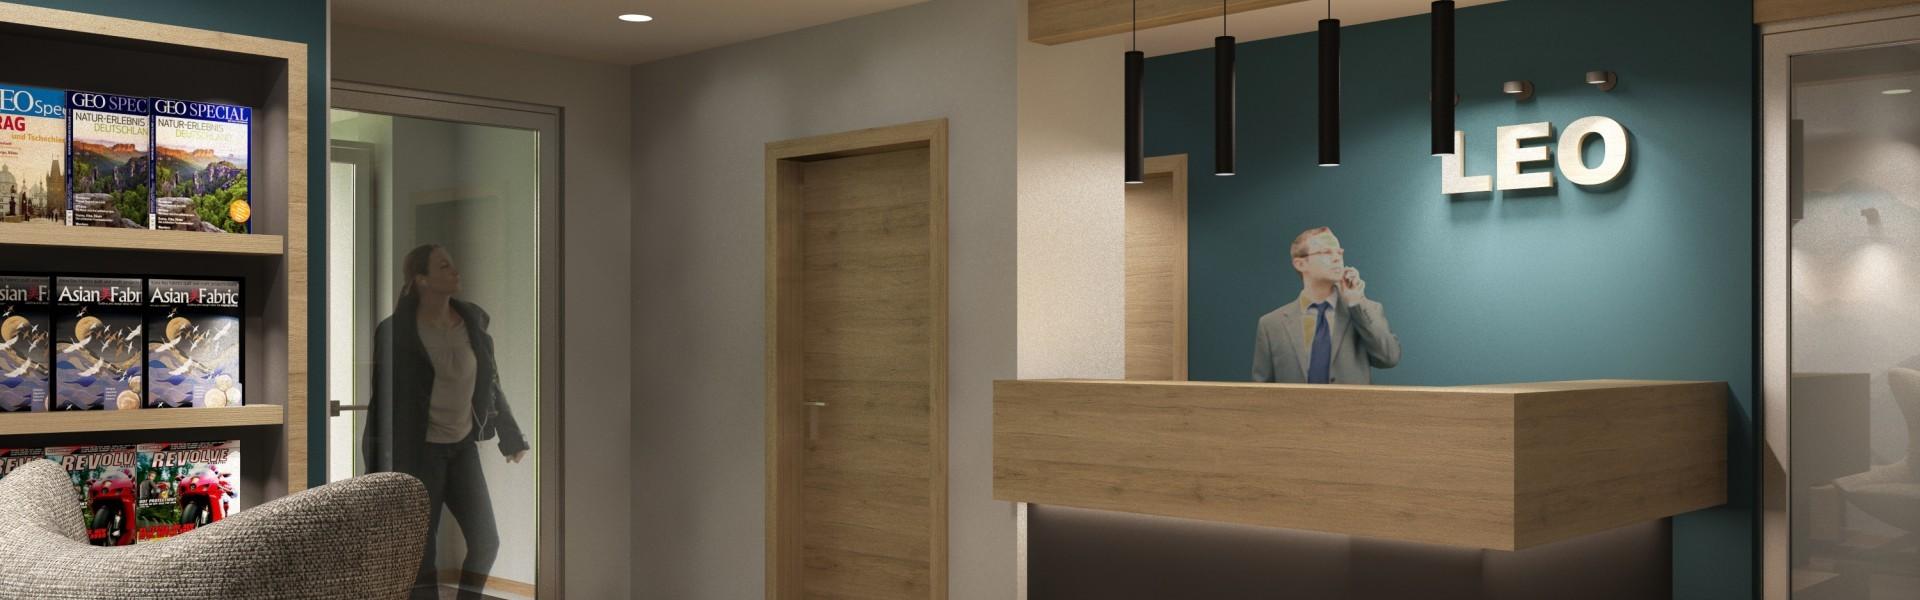 Lobby Leo Apartments- Boardinghouse Miesbach bei München